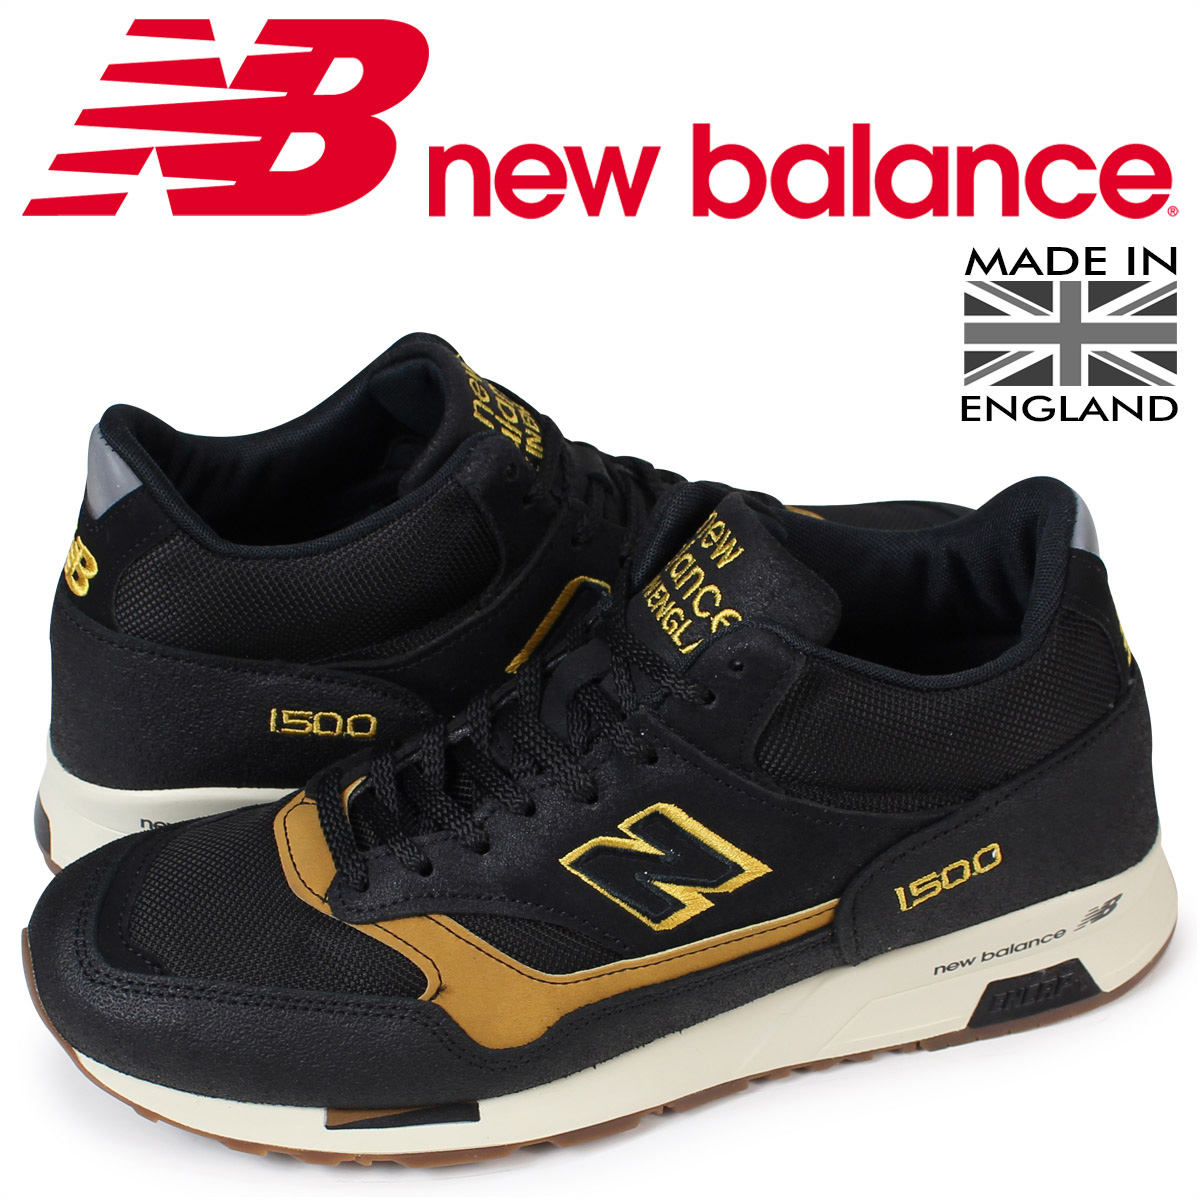 1500 new balance black